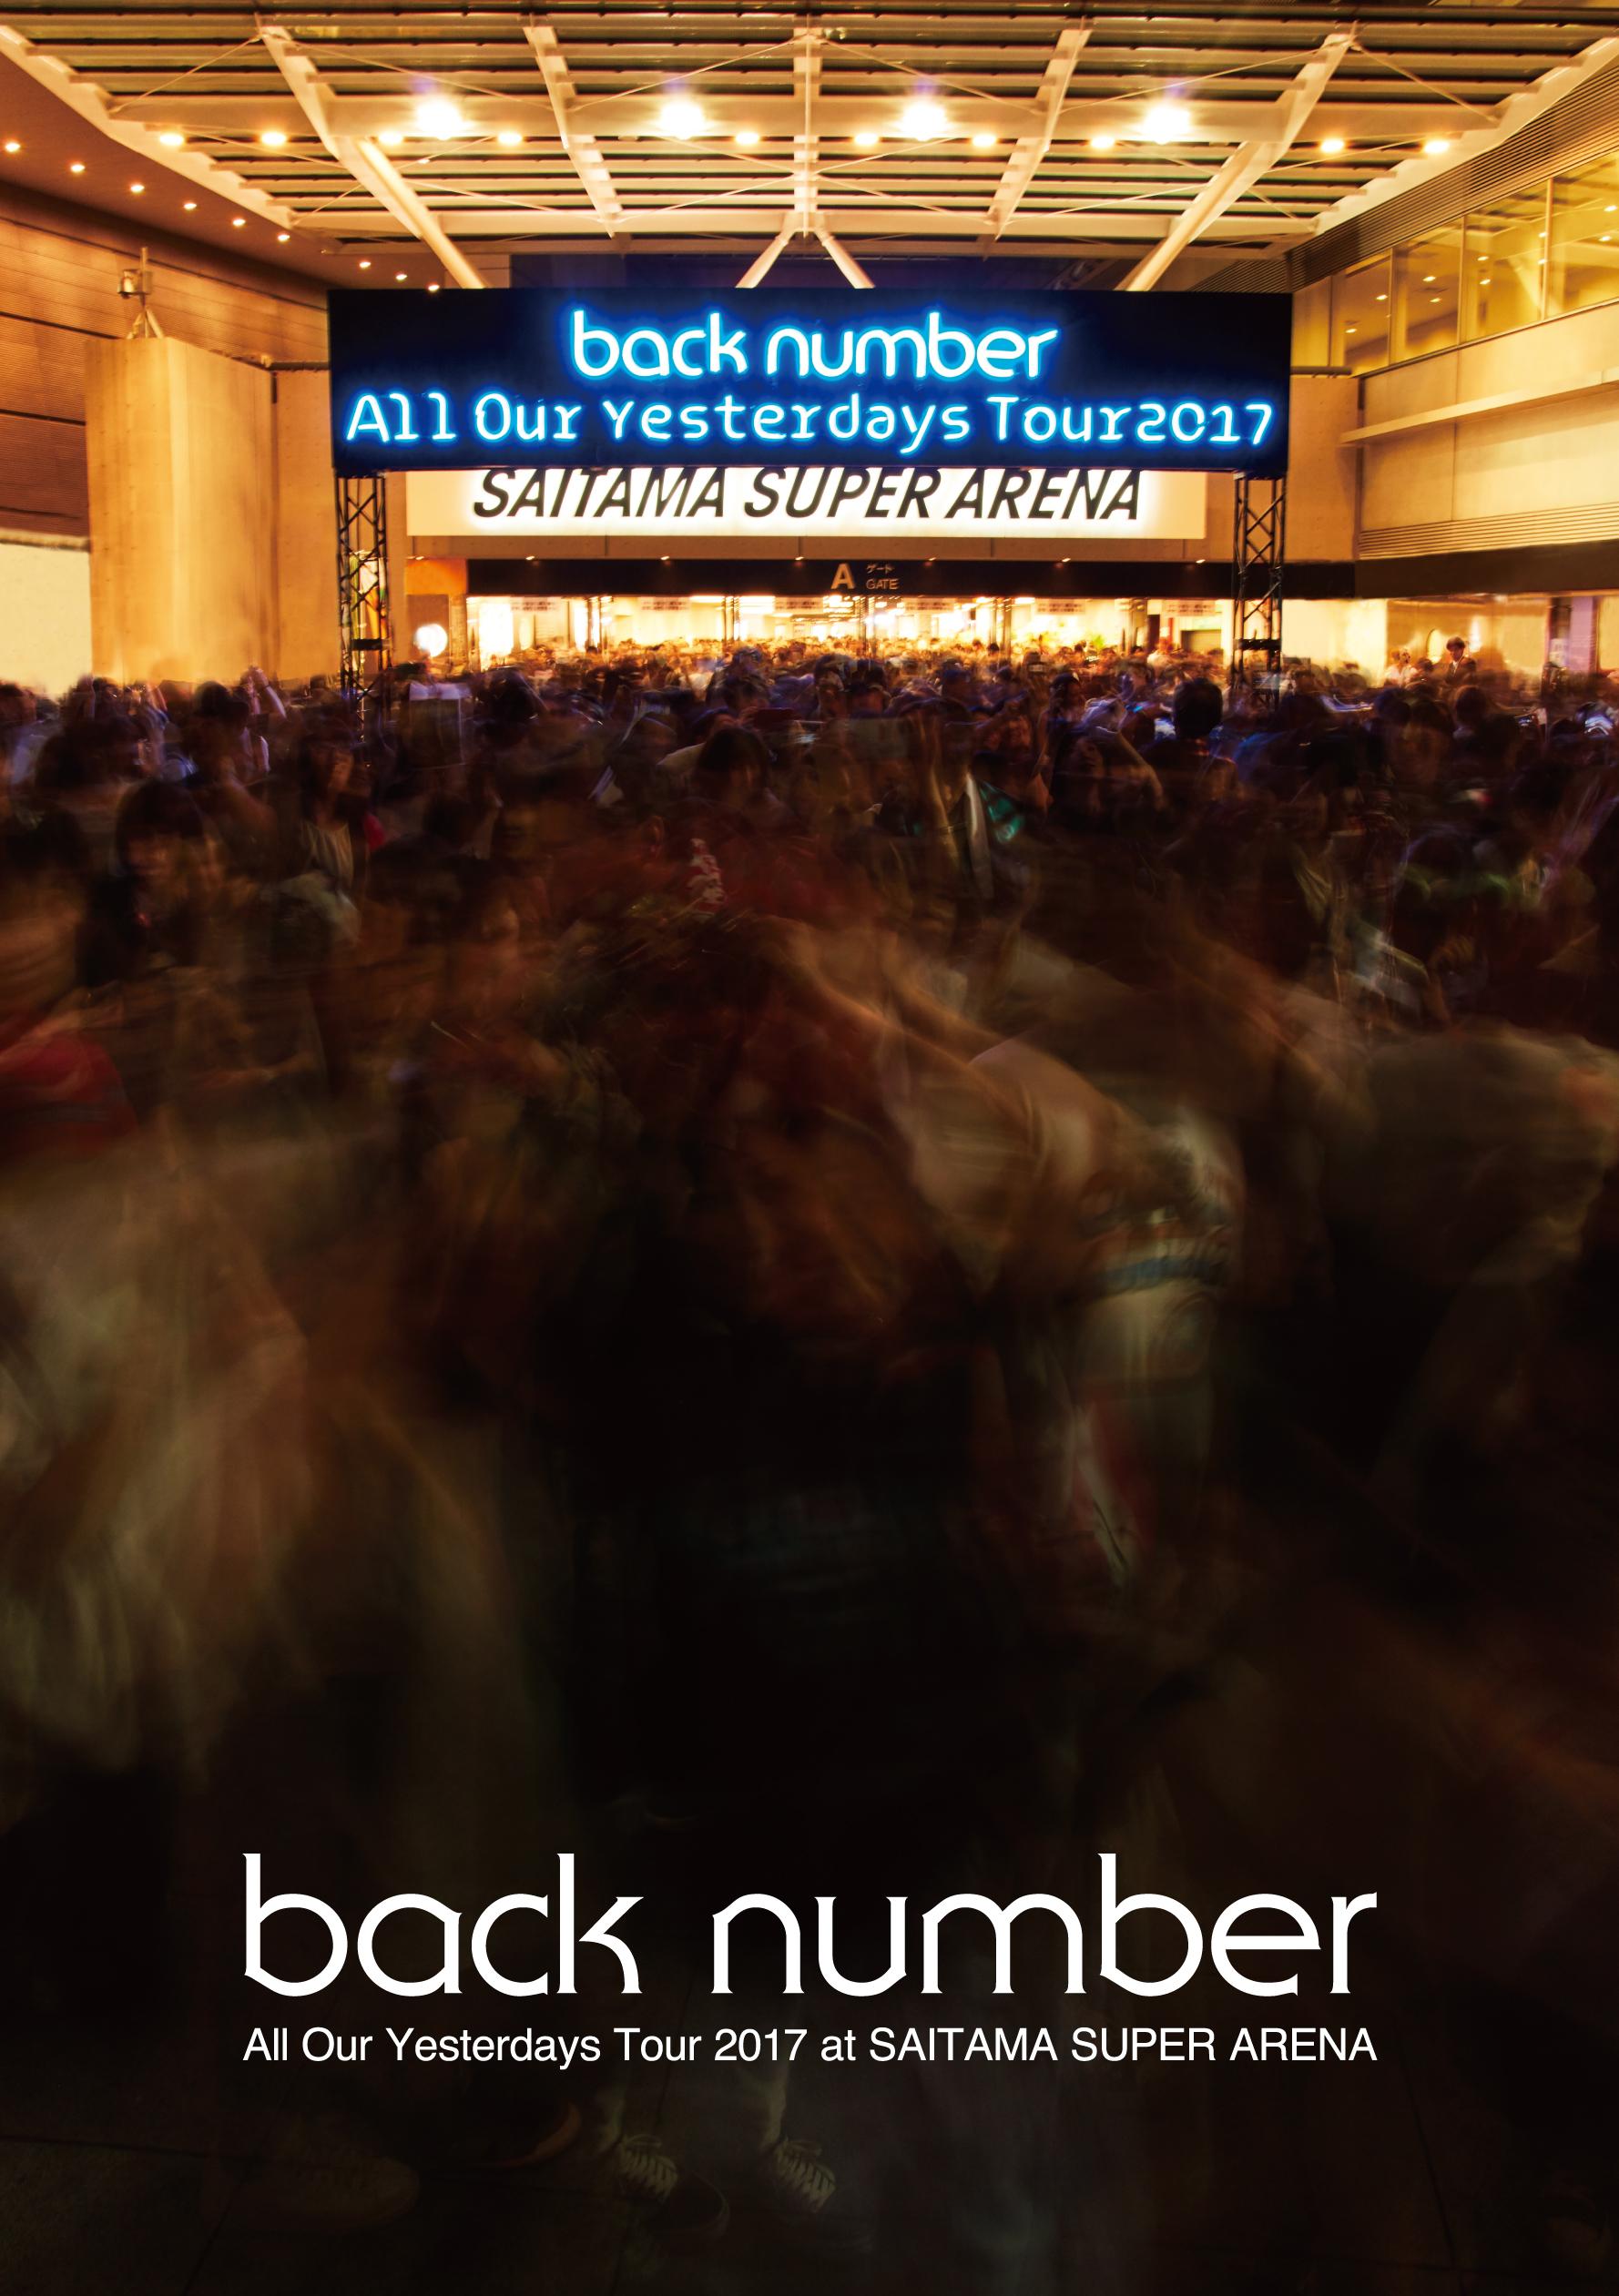 All Our Yesterdays Tour 2017 at SAITAMA SUPER ARENA【通常盤】【DVD&Blu-ray】